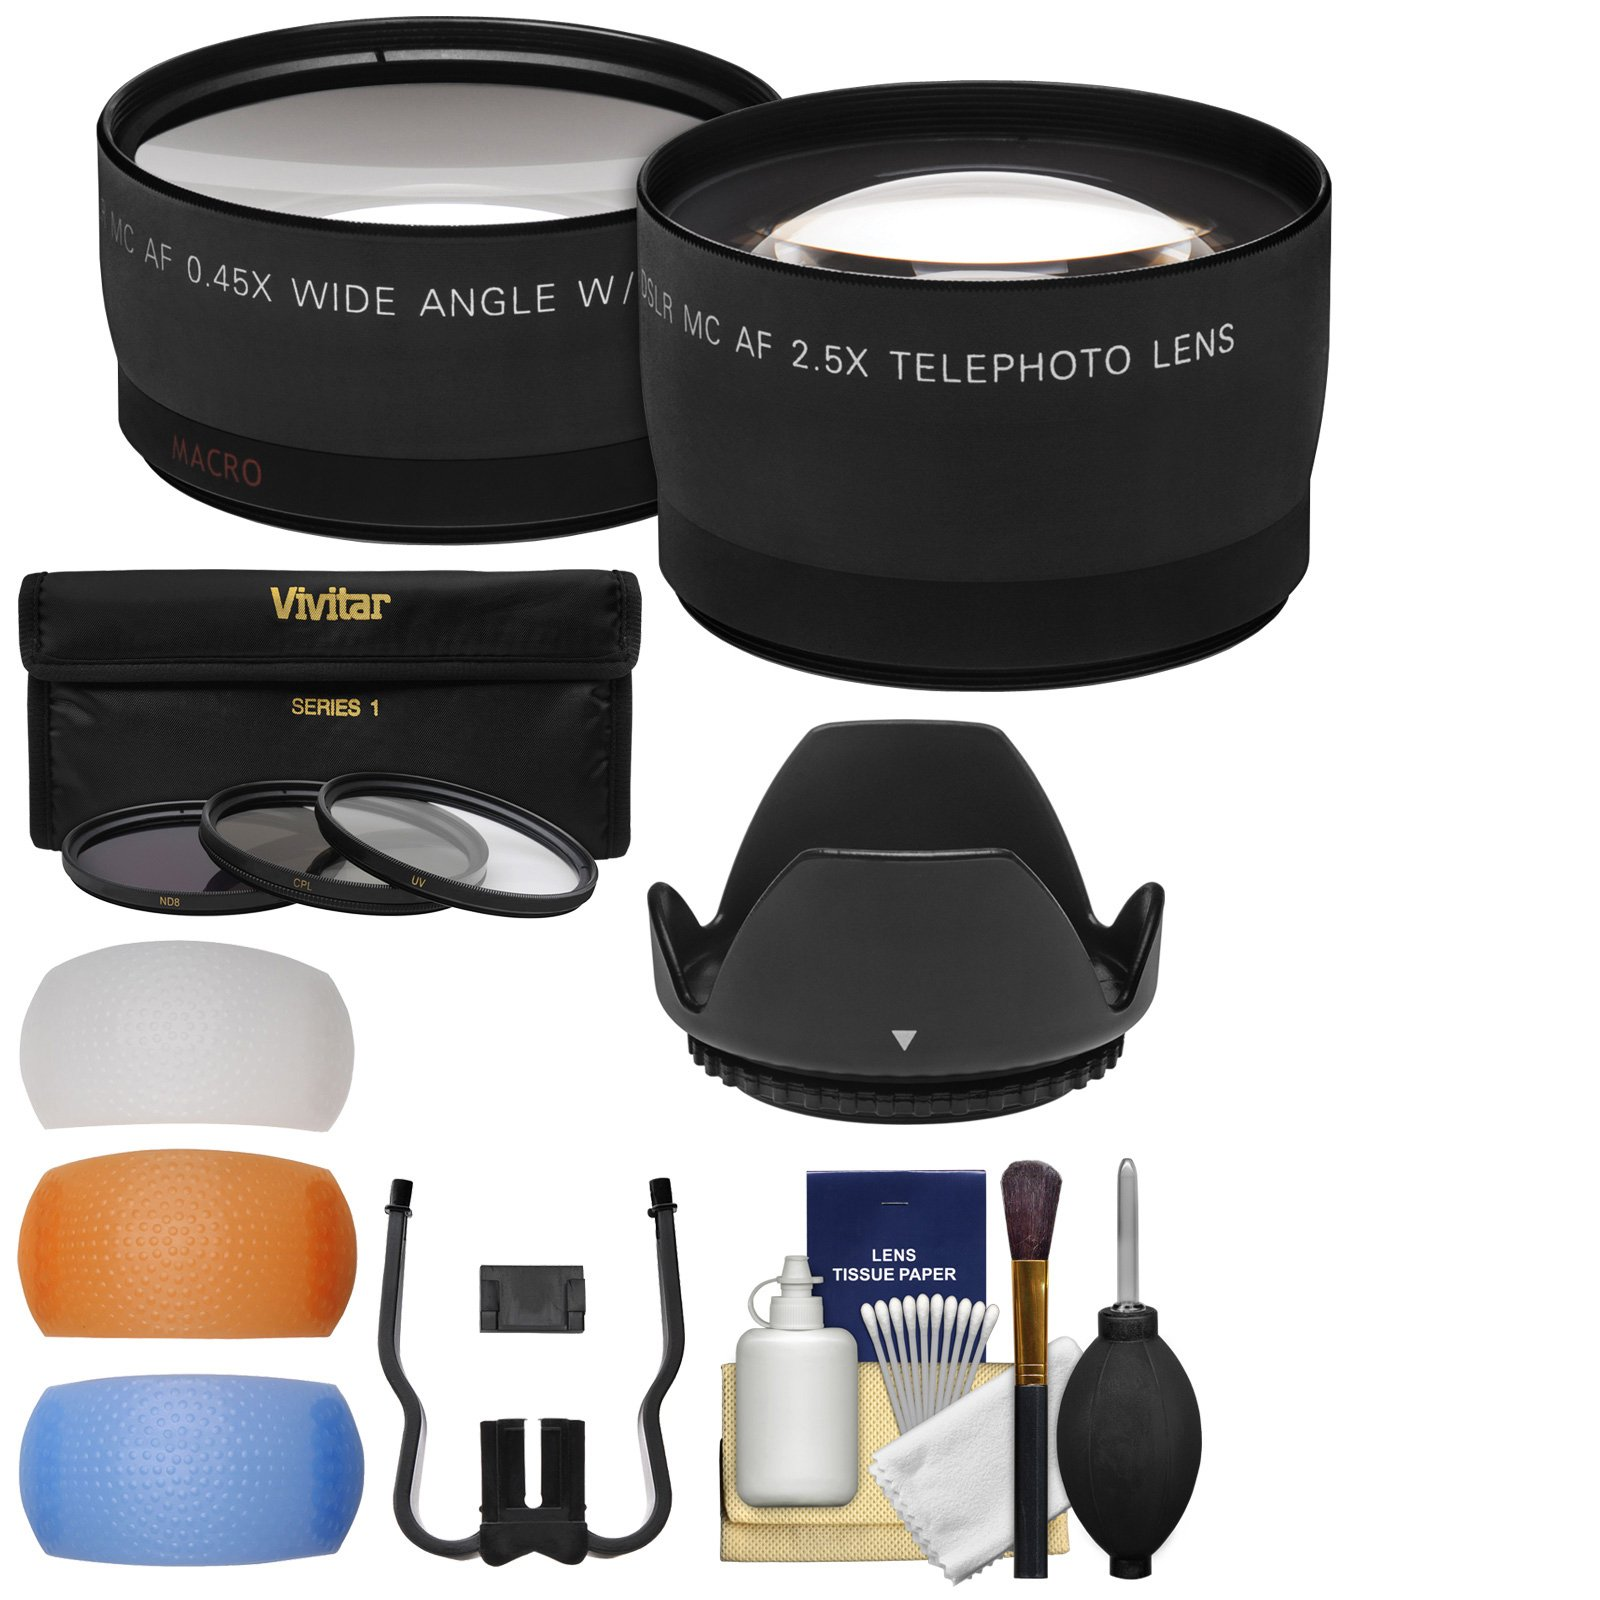 Essentials Bundle for Canon Rebel SL2, SL3, T6, T6i, T6s, T7, T7i Camera & 18-55mm Lens + Tele & Wide Lenses + 3 Filters + Diffusers + Hood + Kit